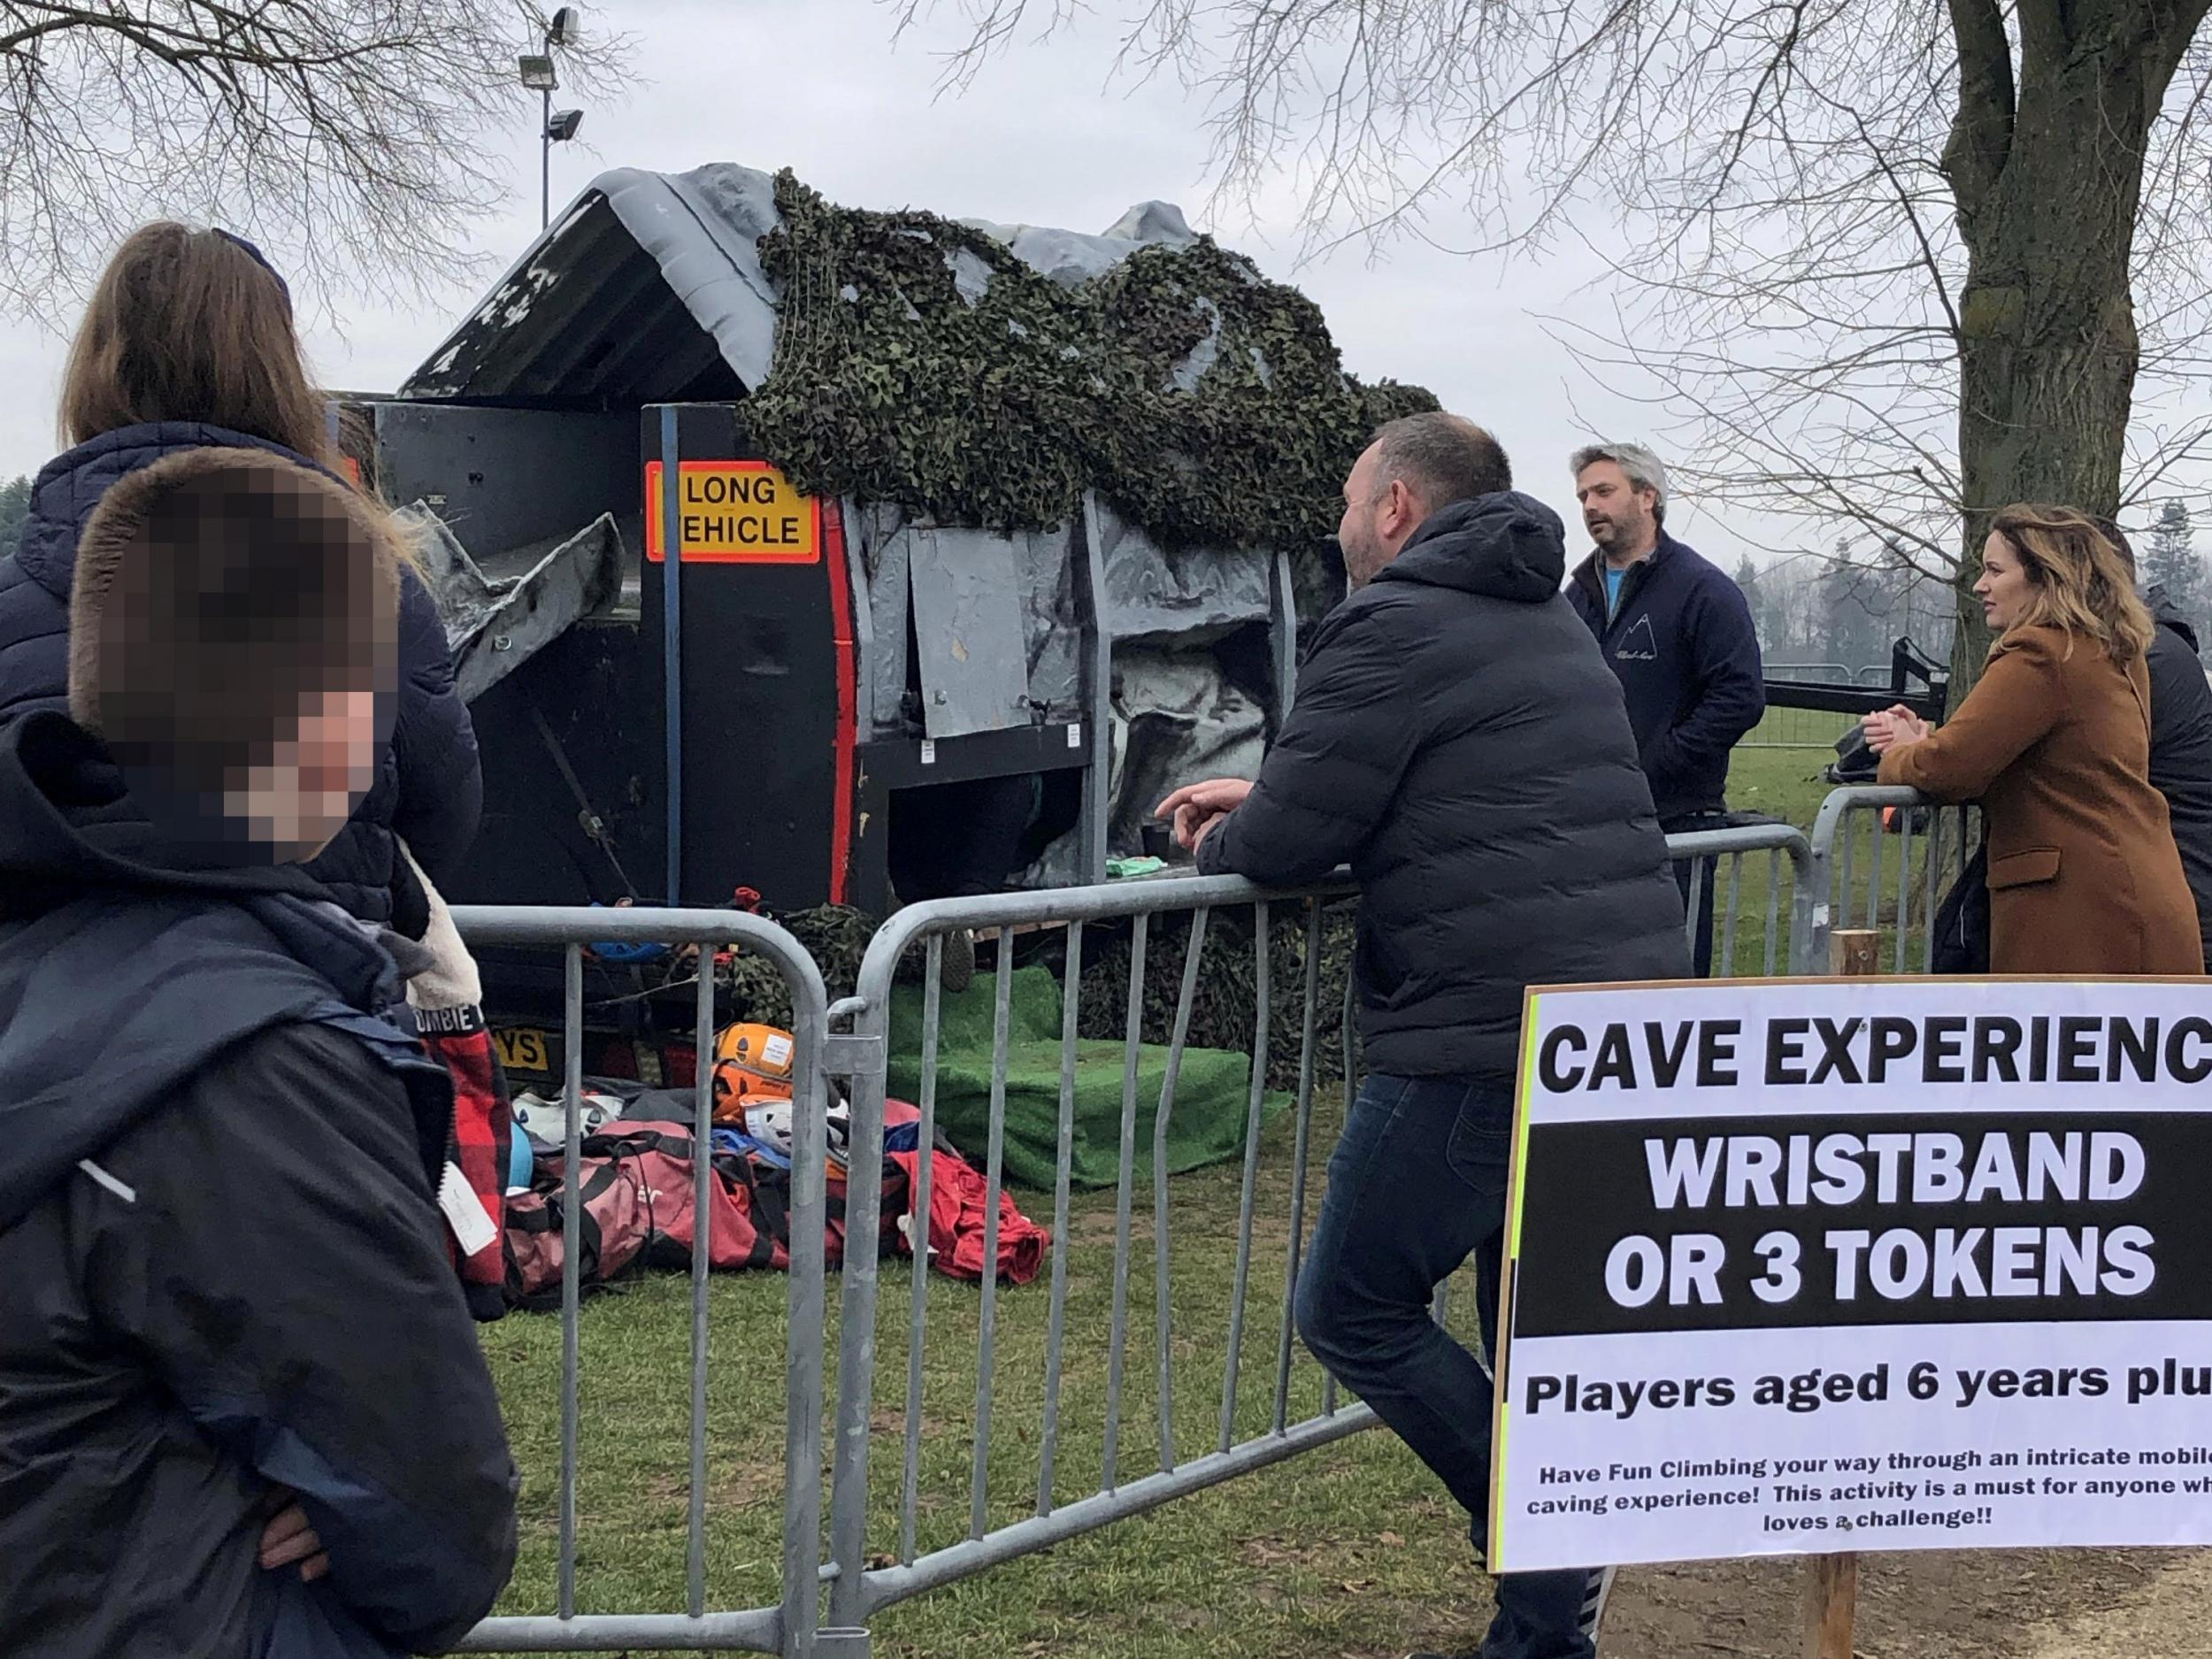 Fortnite Live: Furious parents demand refunds after 'horrendous' event leaves children 'miserable'